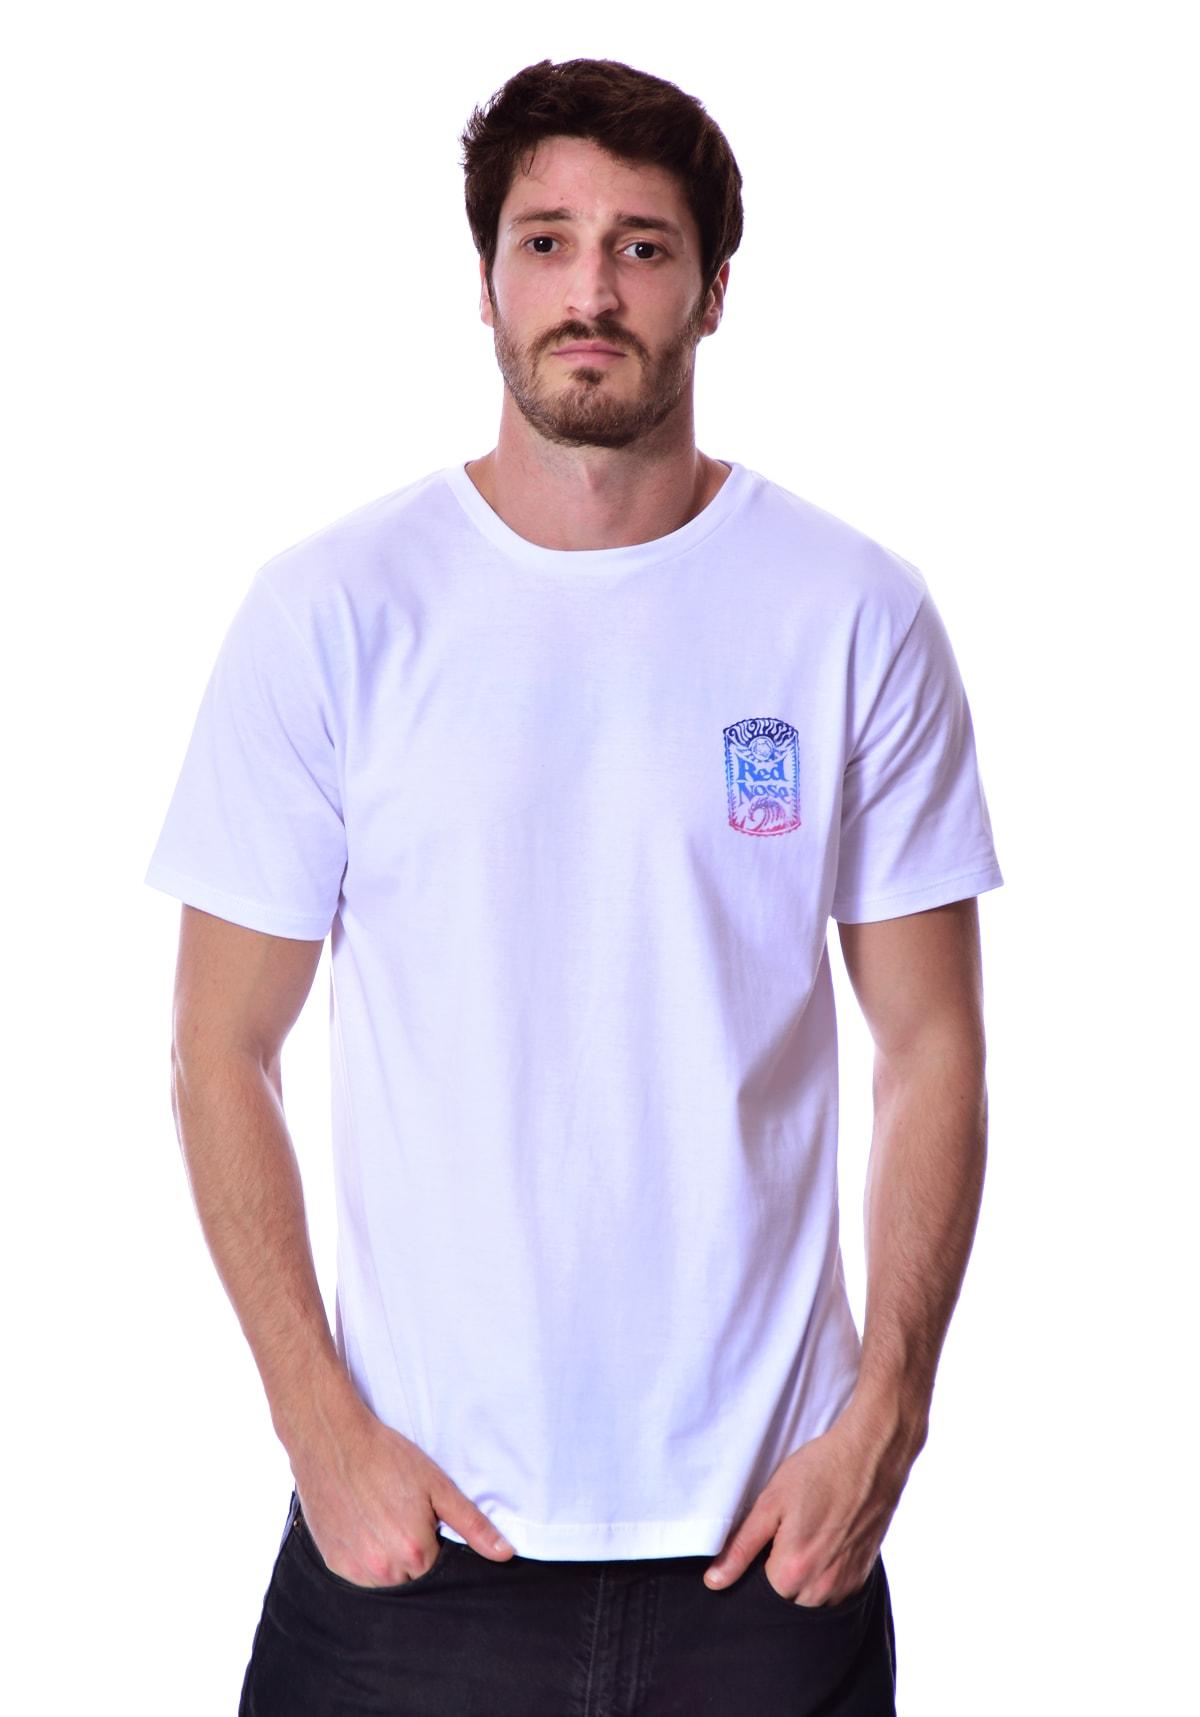 Camiseta Red Nose Surf Old - Branco P